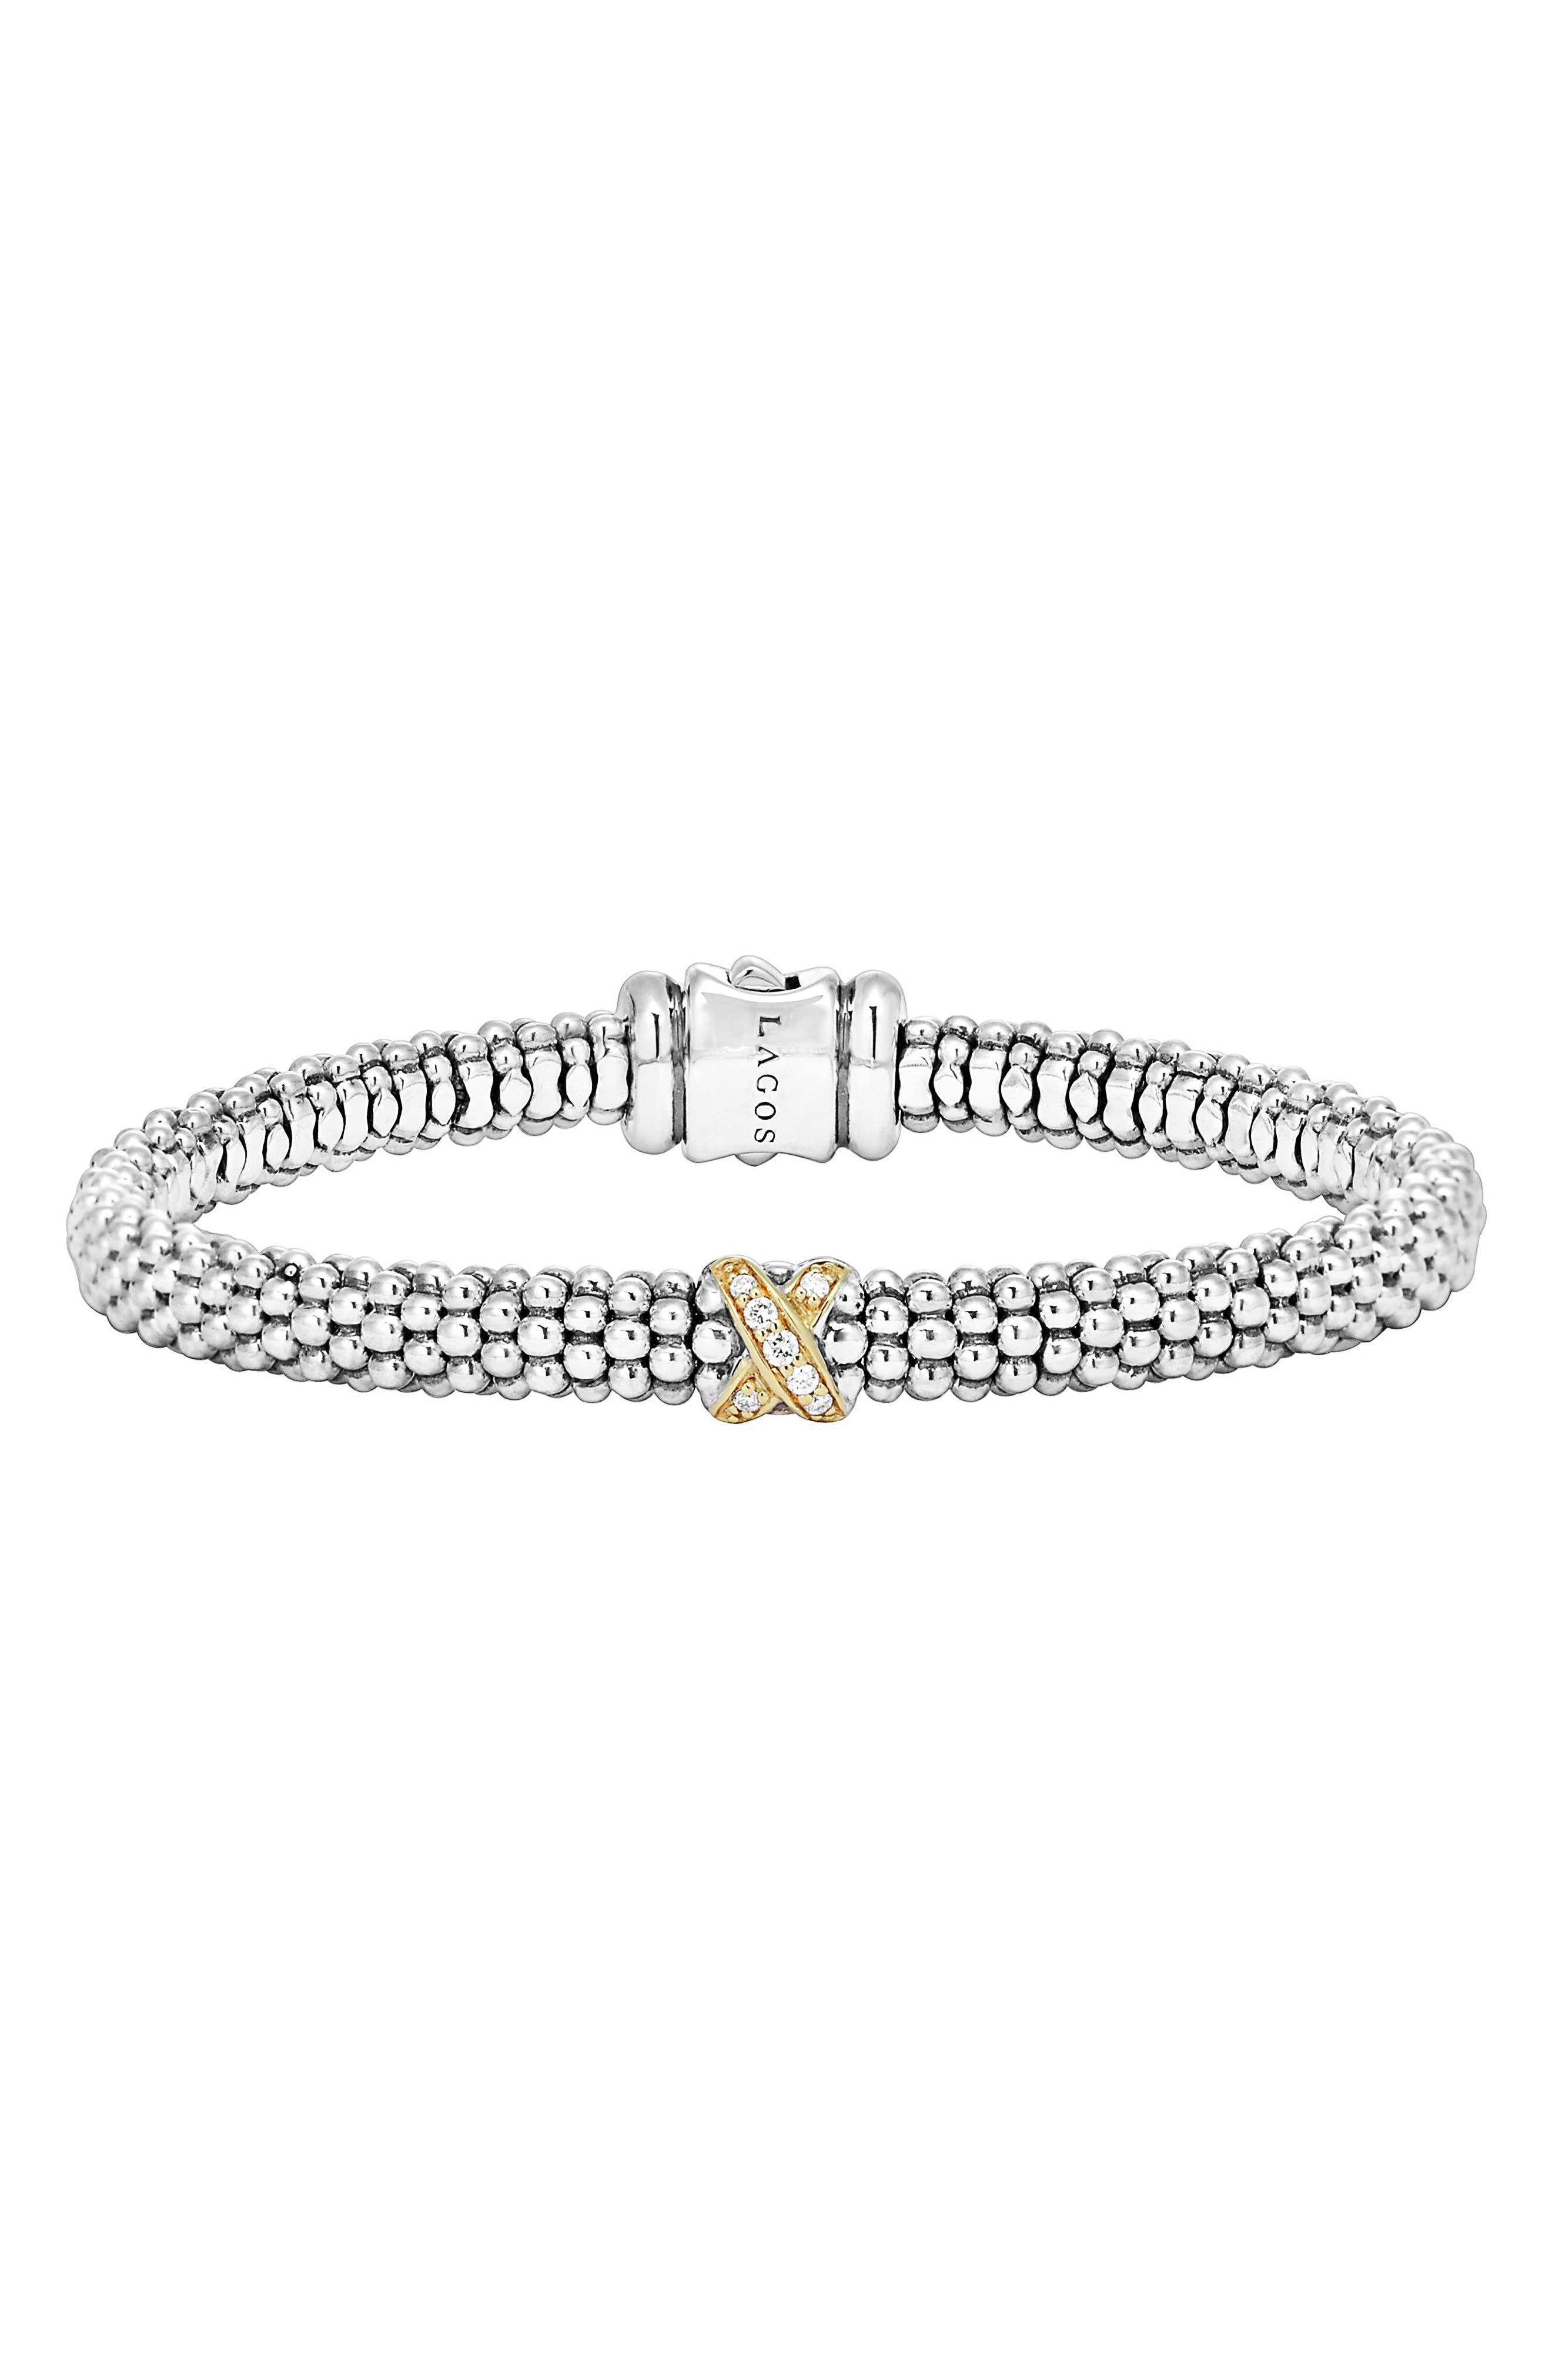 LAGOS, Caviar 'Signature Caviar' Diamond Rope Bracelet, Alternate thumbnail 6, color, STERLING SILVER/ GOLD